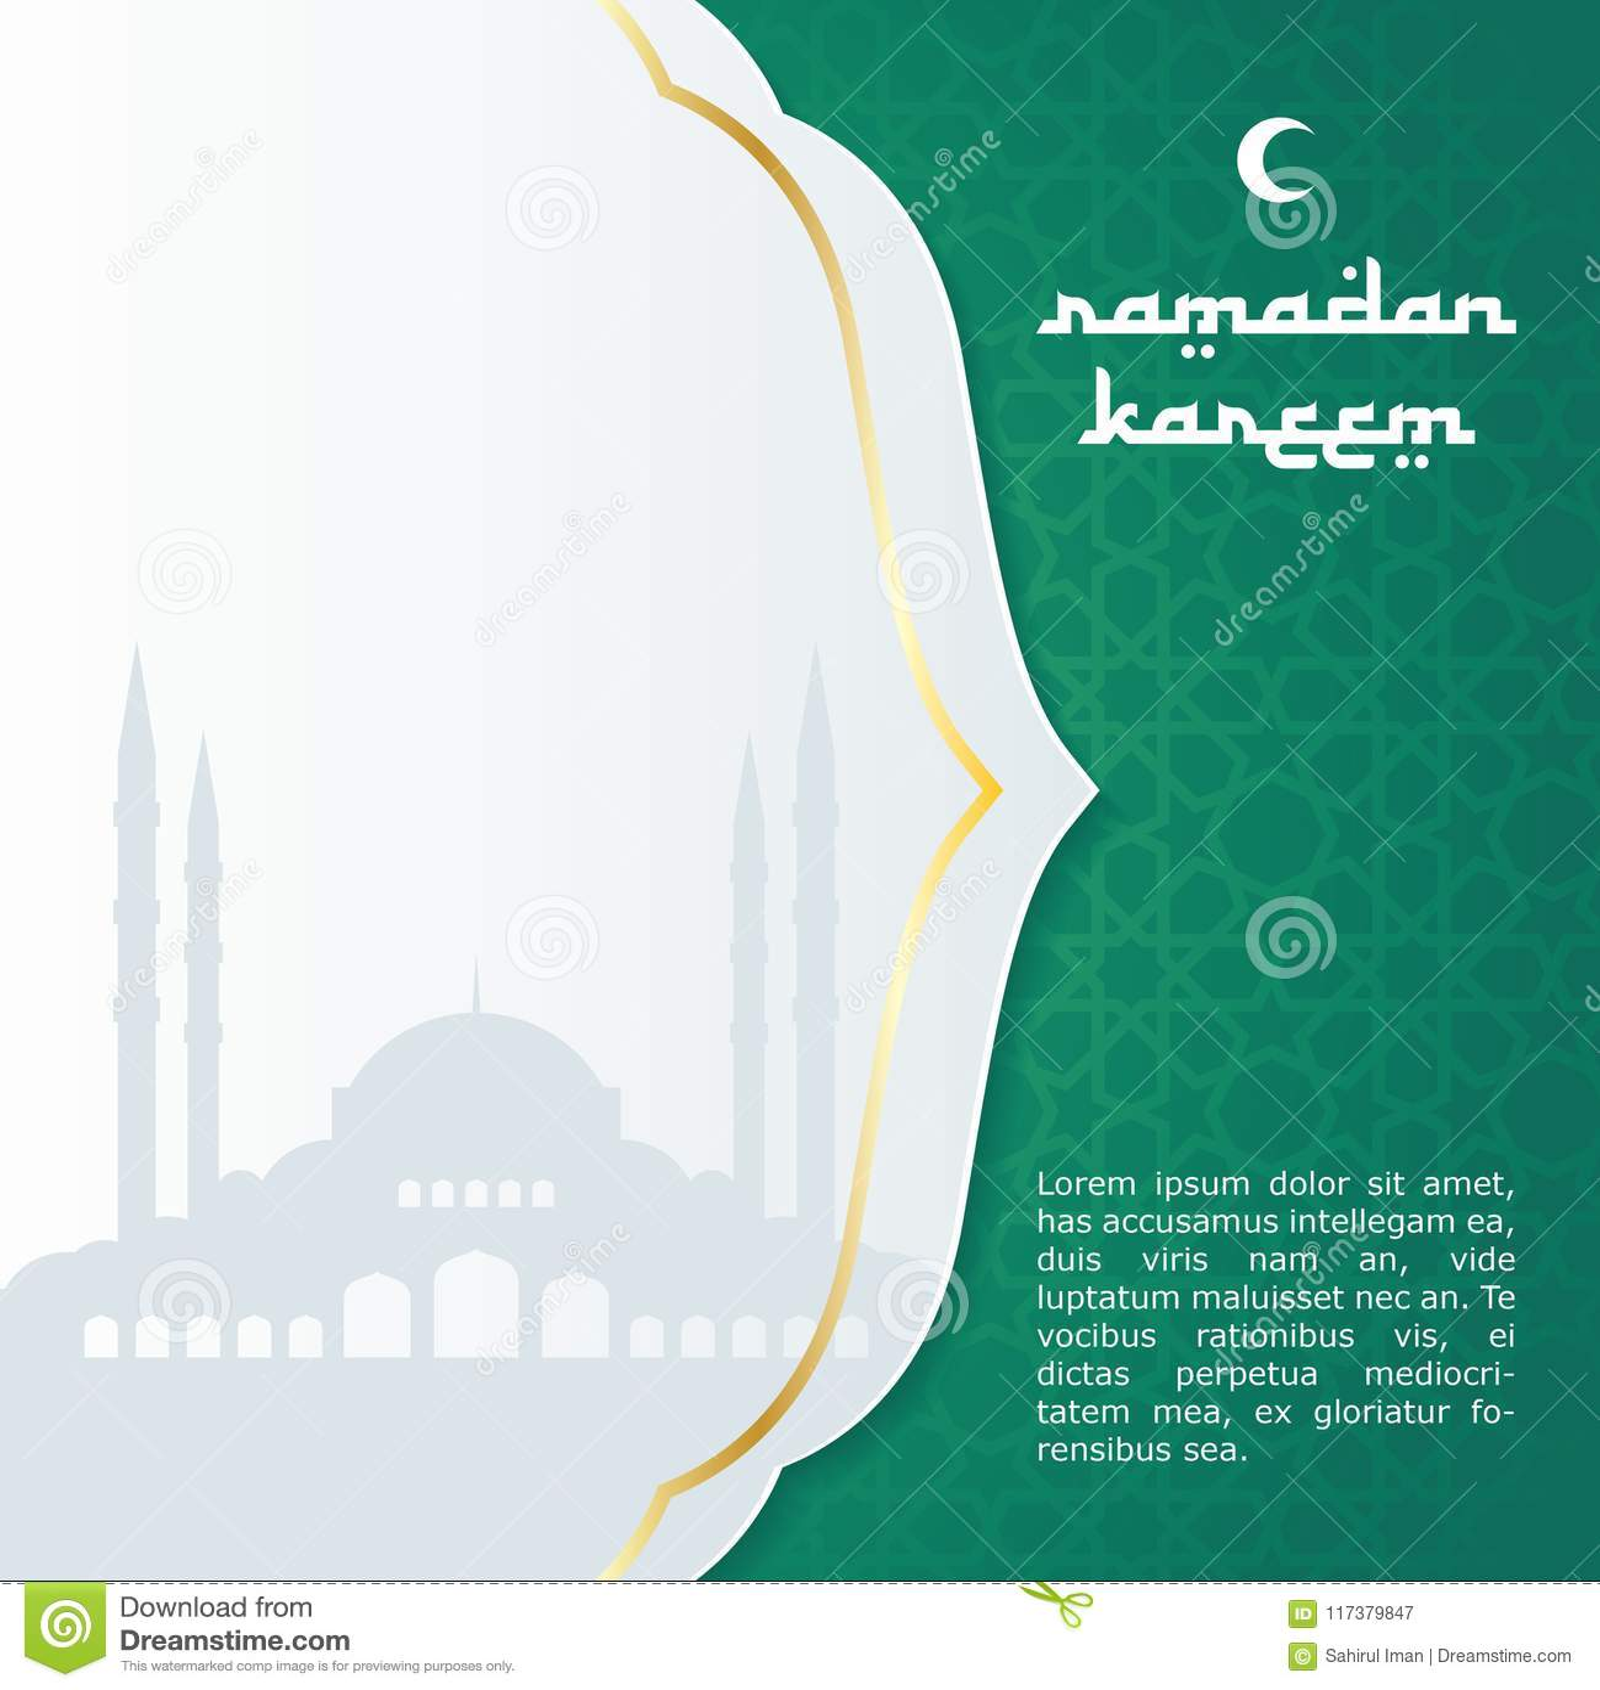 ramadan card  islamic new year  eid fitri card design